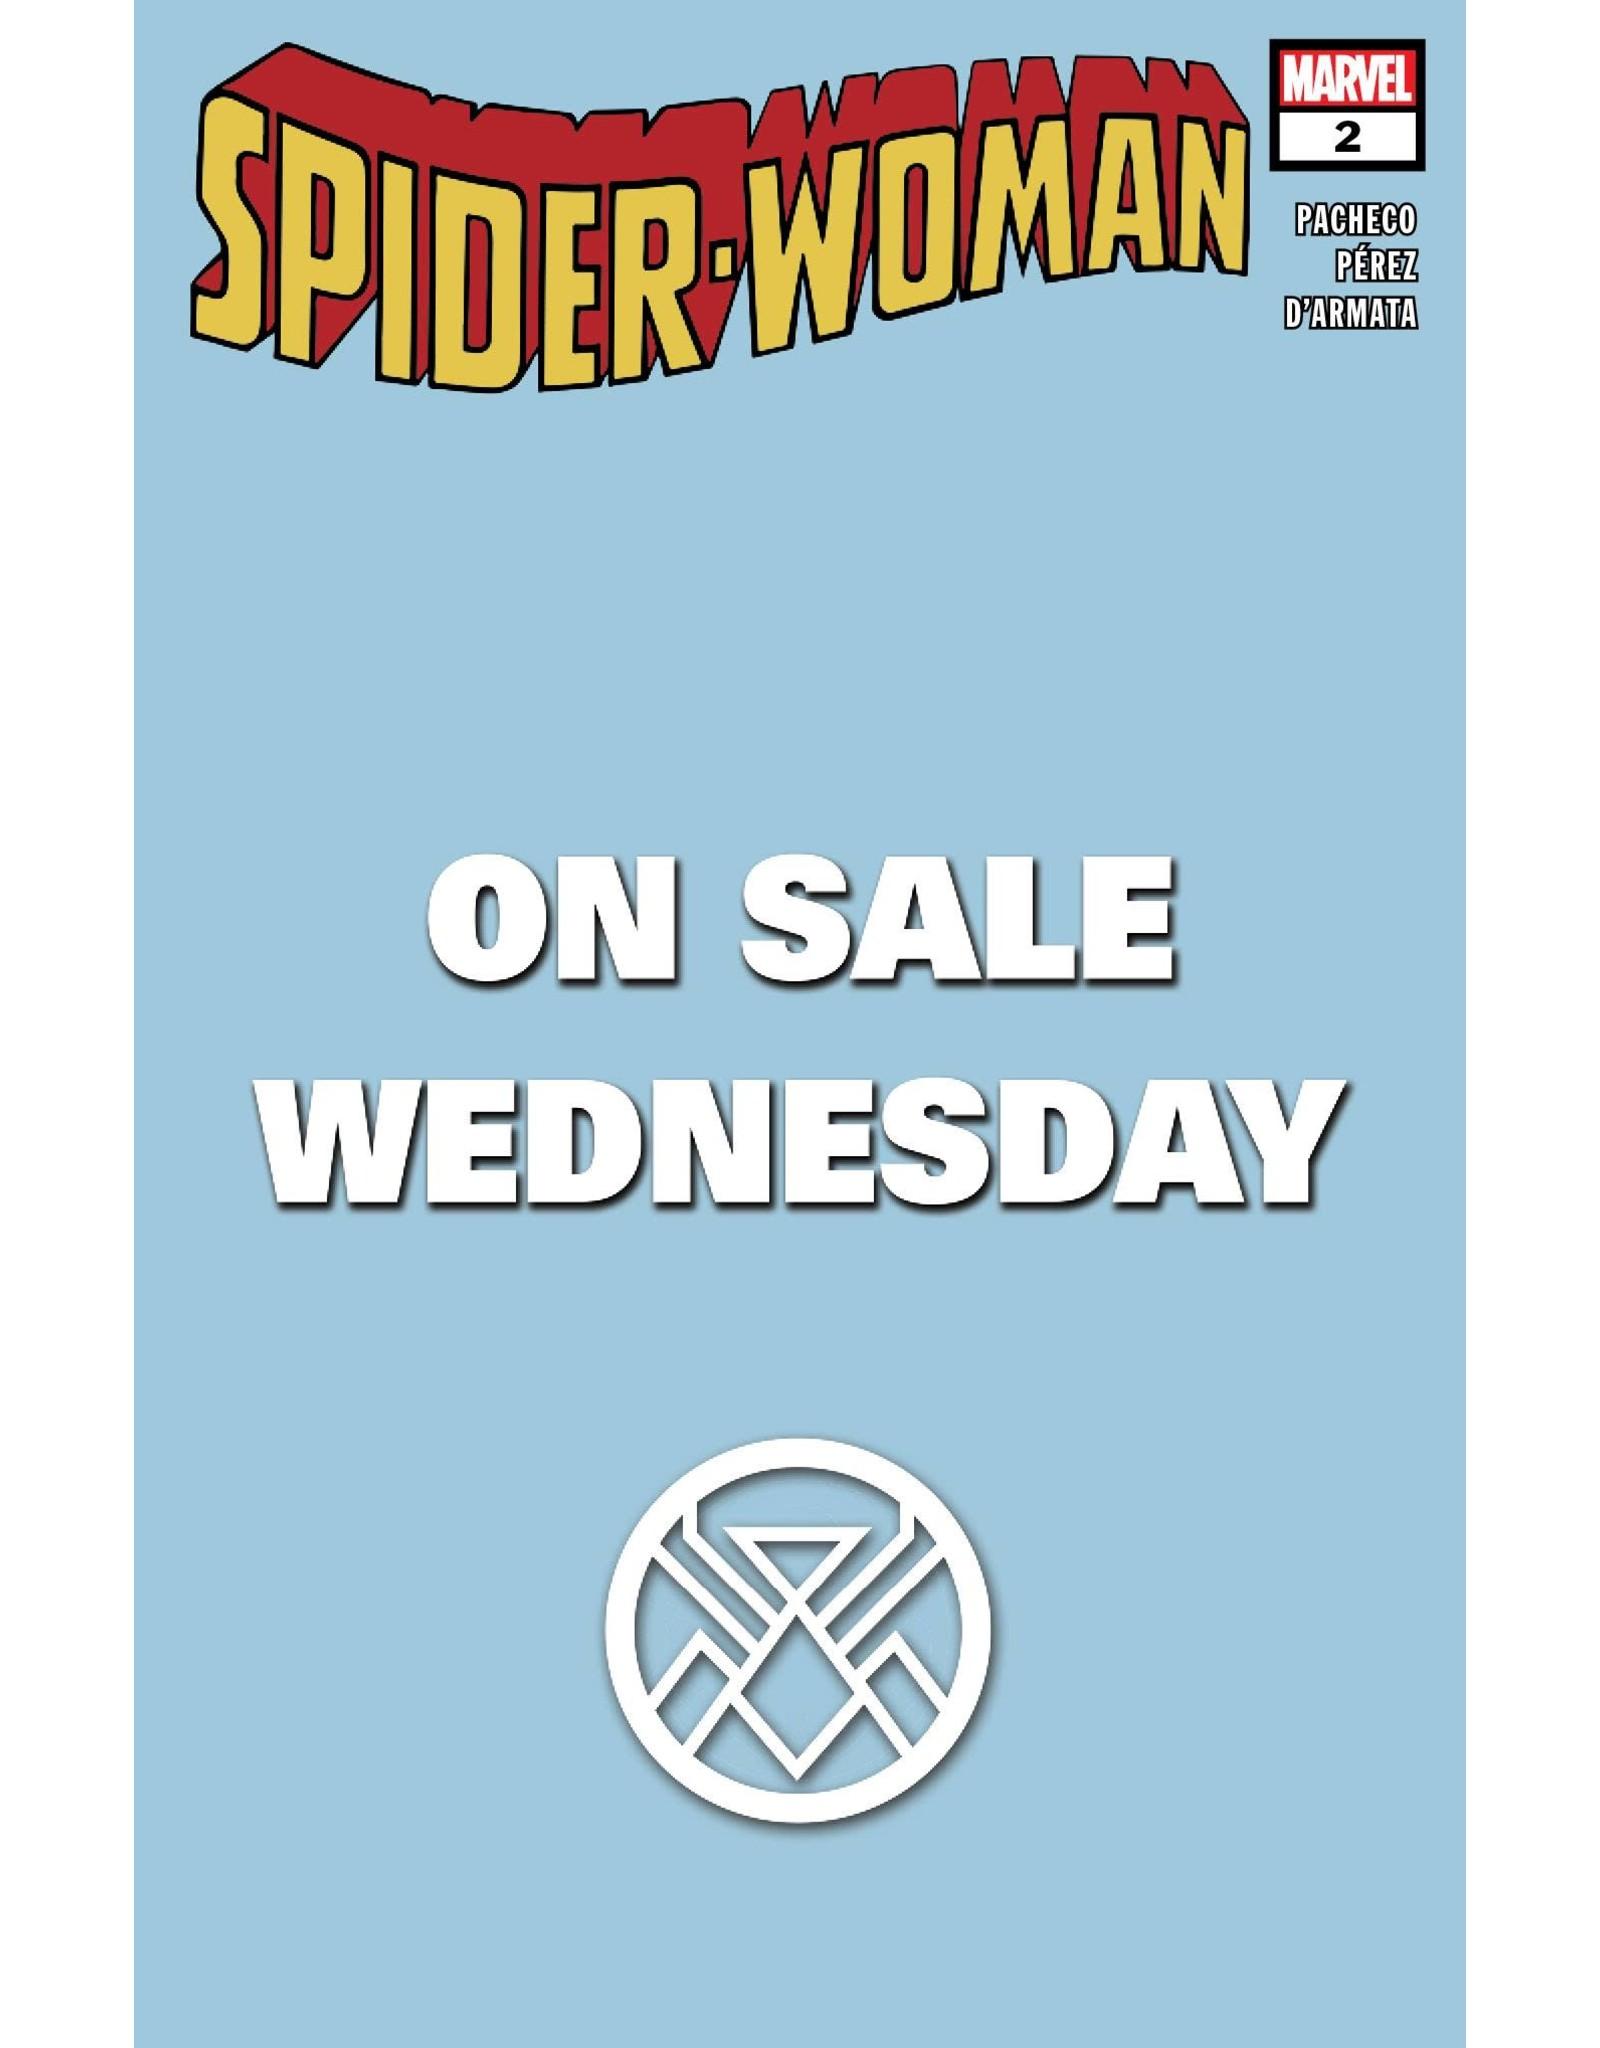 MARVEL COMICS SPIDER-WOMAN #2 MARVEL WEDNESDAY VAR